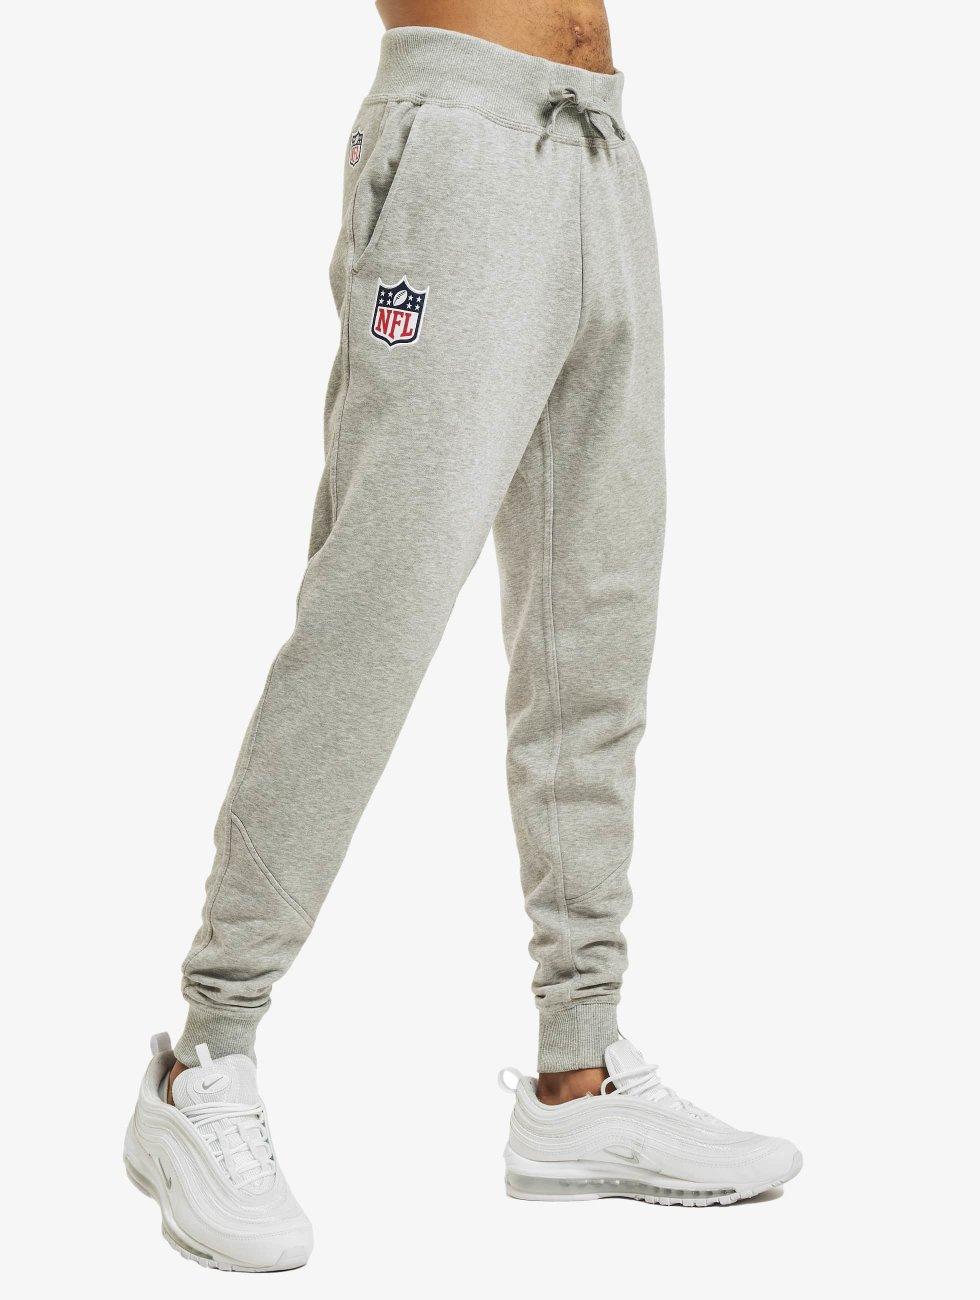 New Era Sweat Pant NFL gray